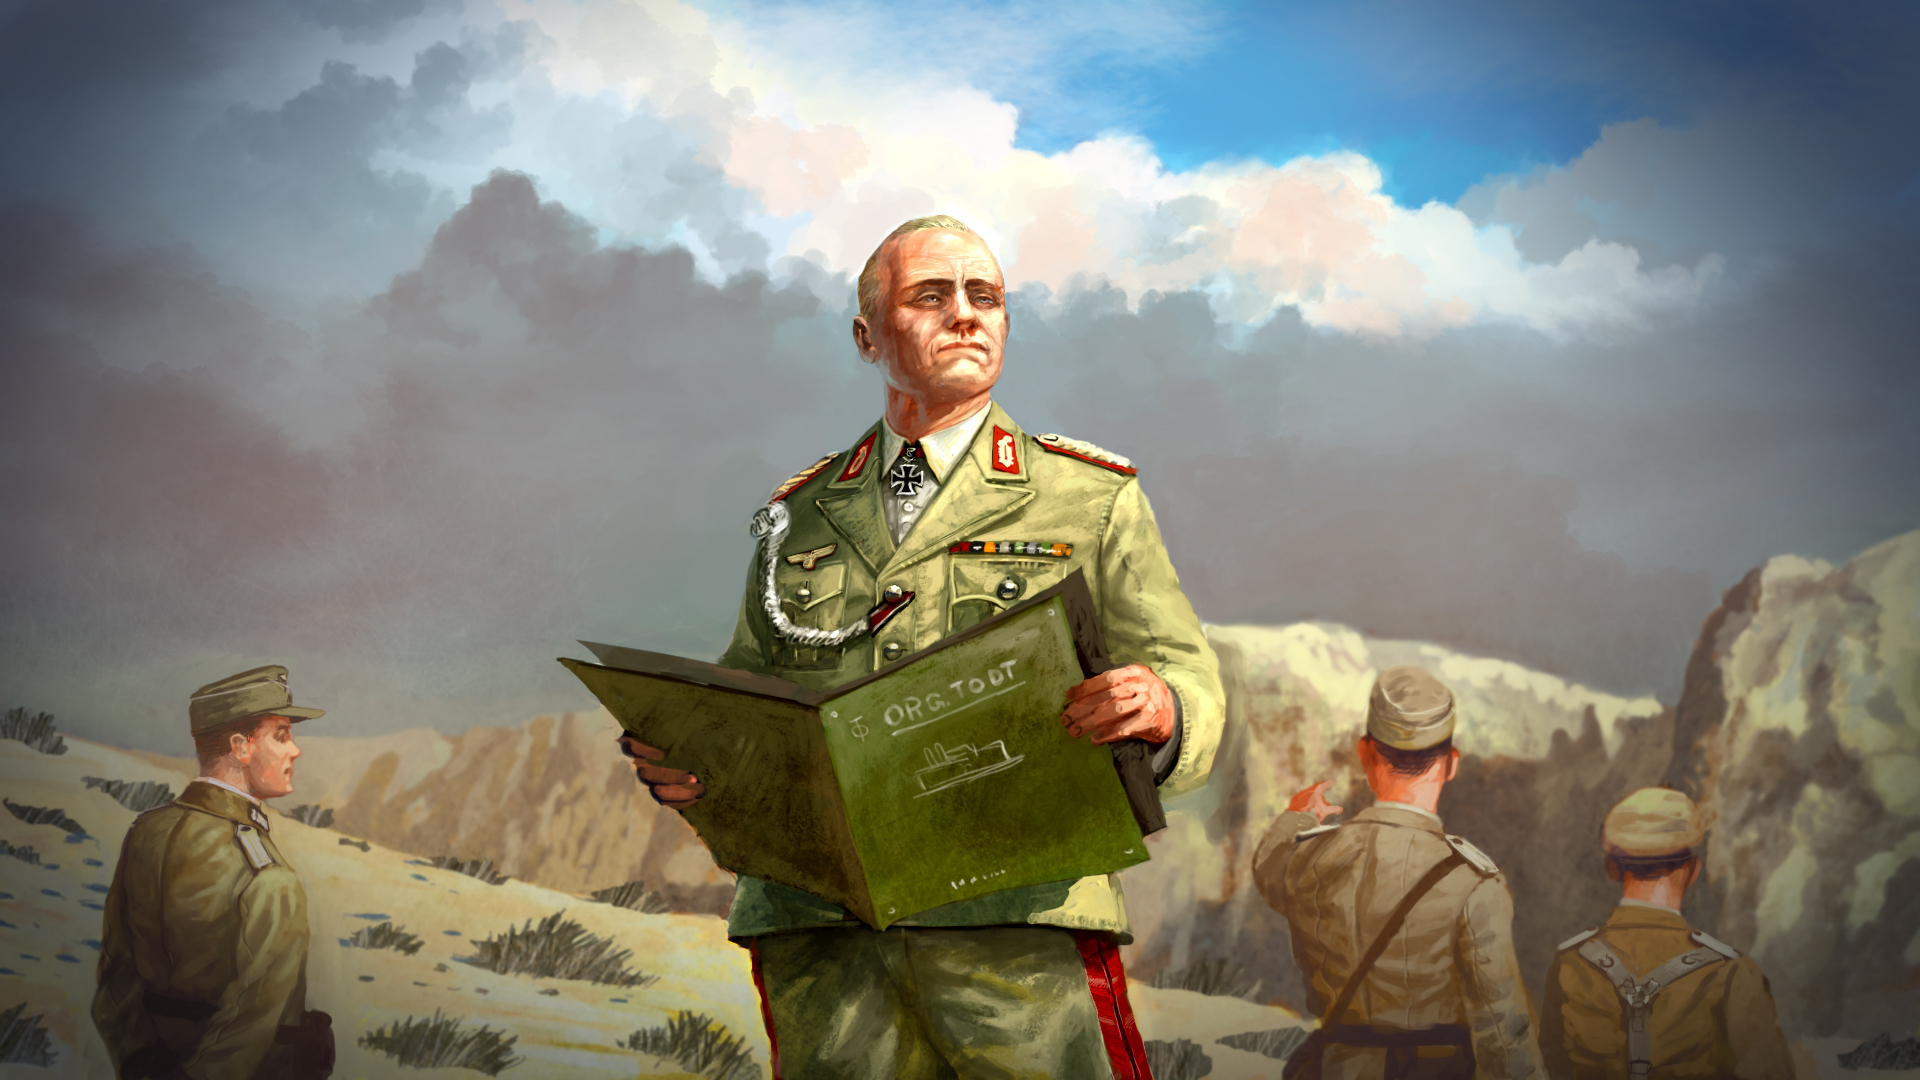 Sniper Elite 3 Wallpaper: Steam Trading Cards Wiki